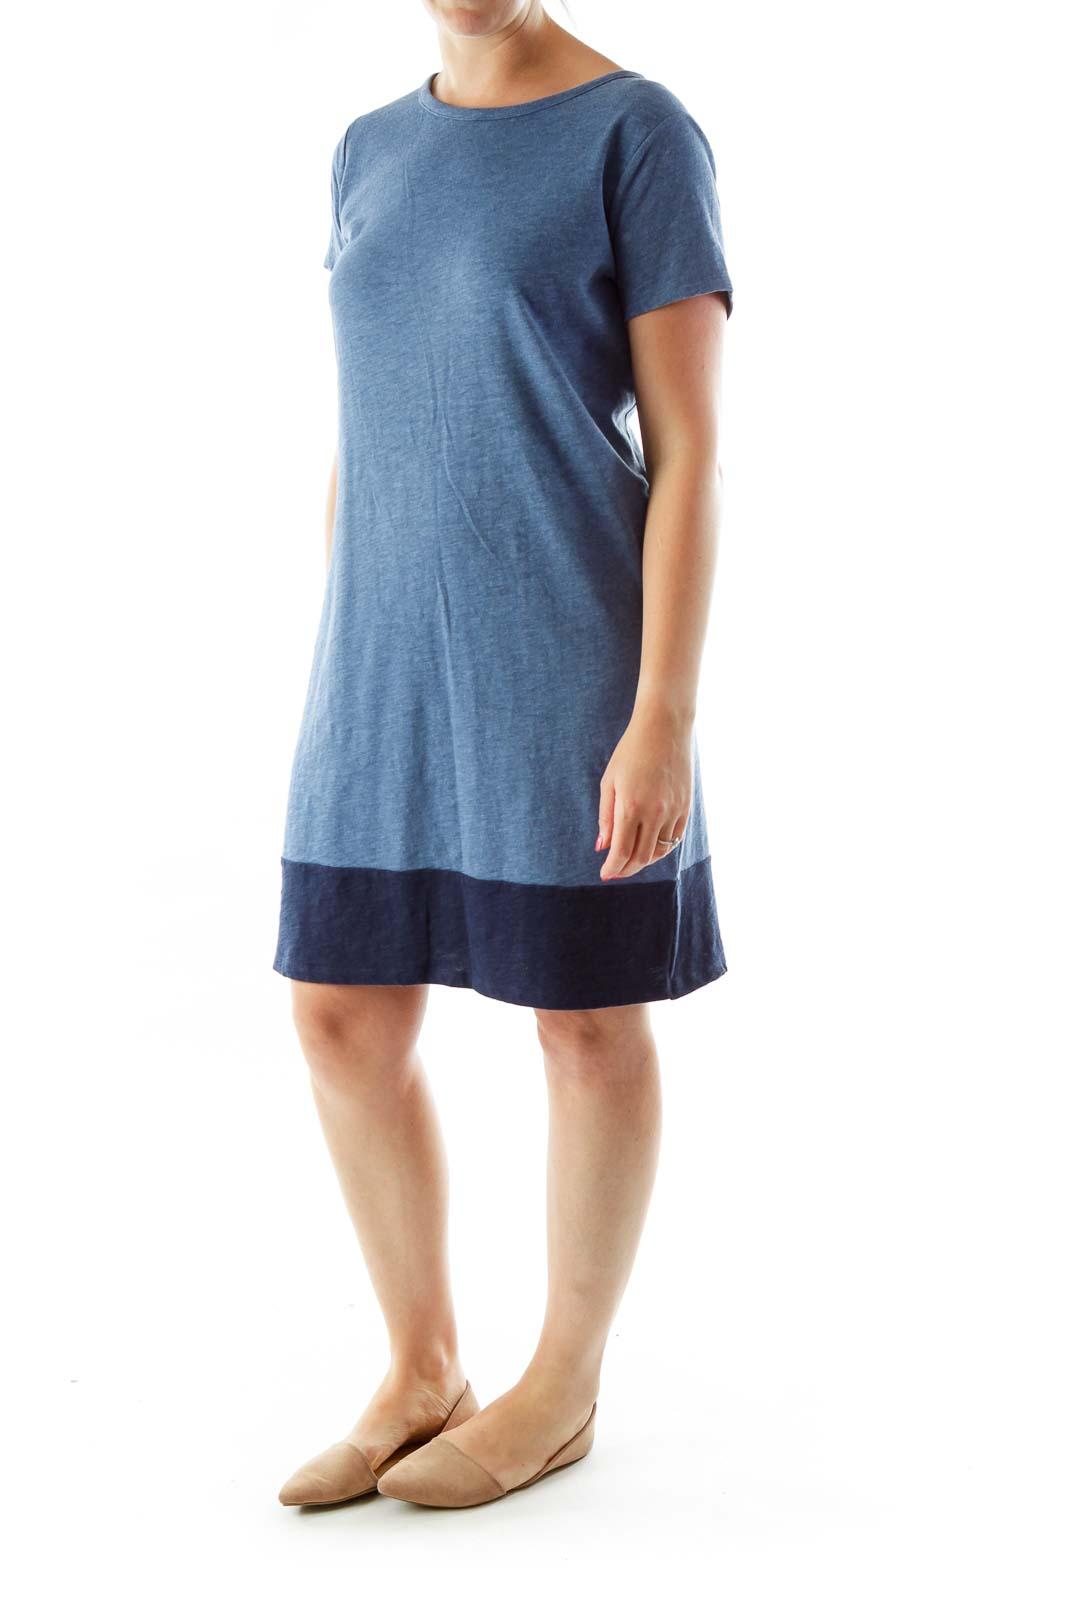 Bicolor Blue Navy Jersey Dress